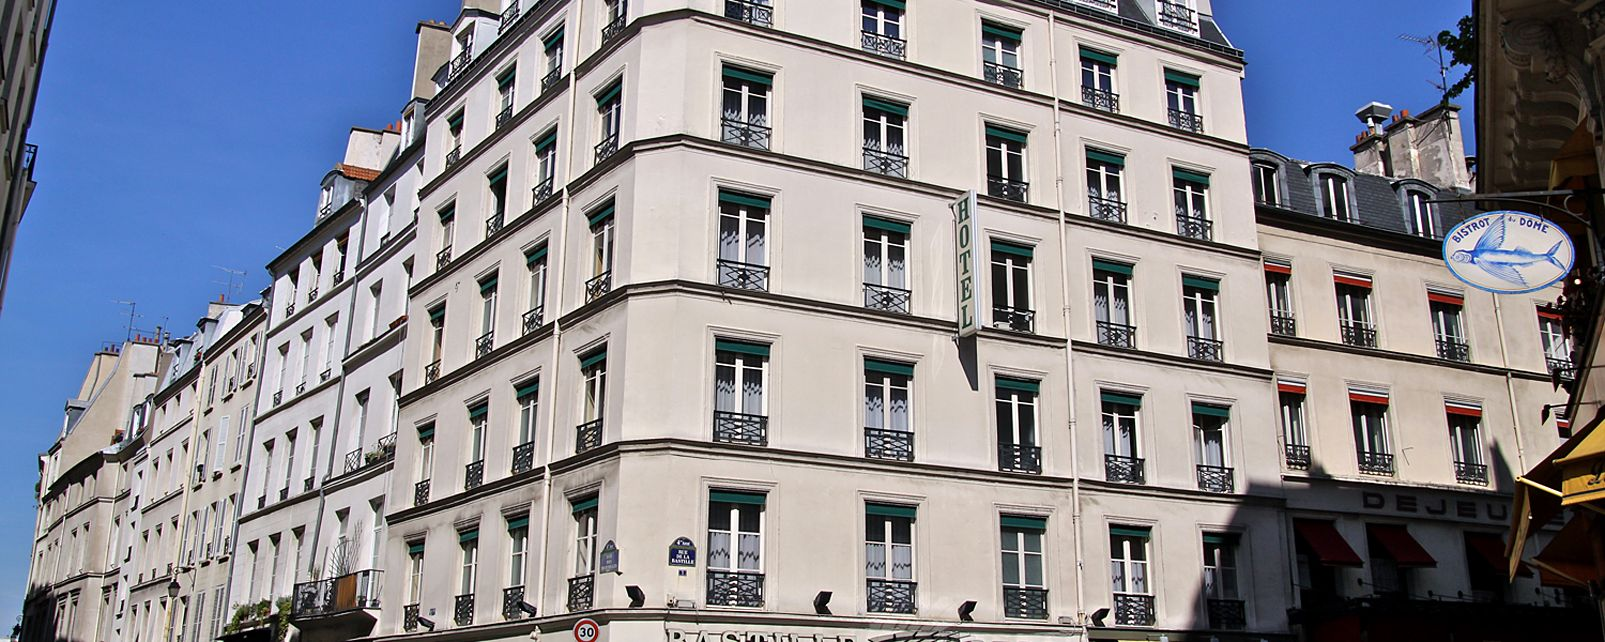 Hotel Bastille Speria  Parigi  Francia